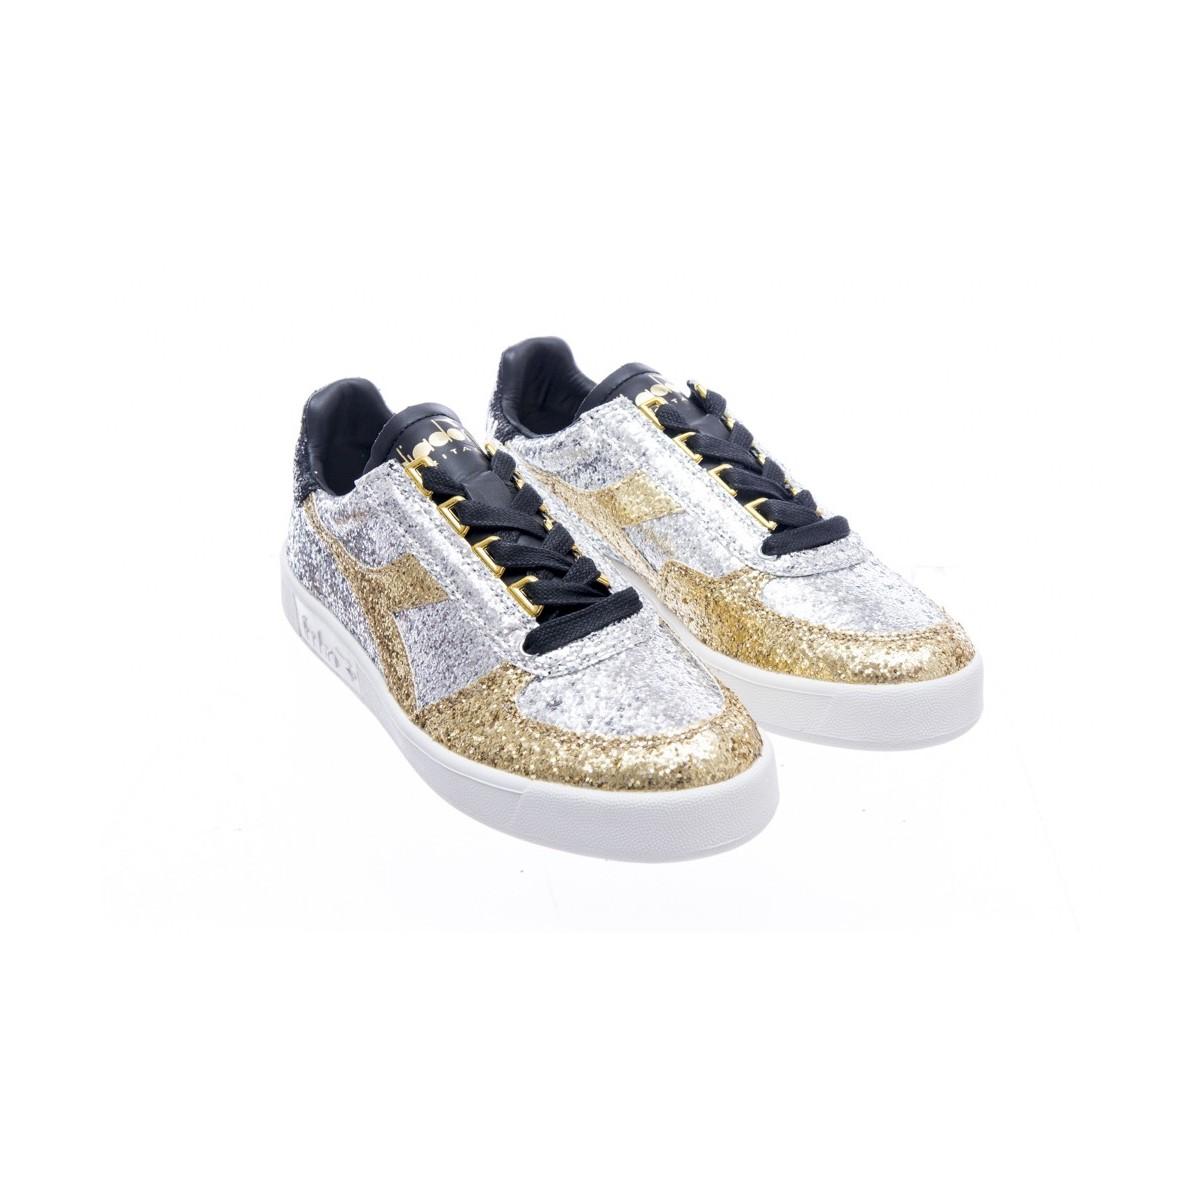 Scarpa Diadora - B.elite glitter 201.171395